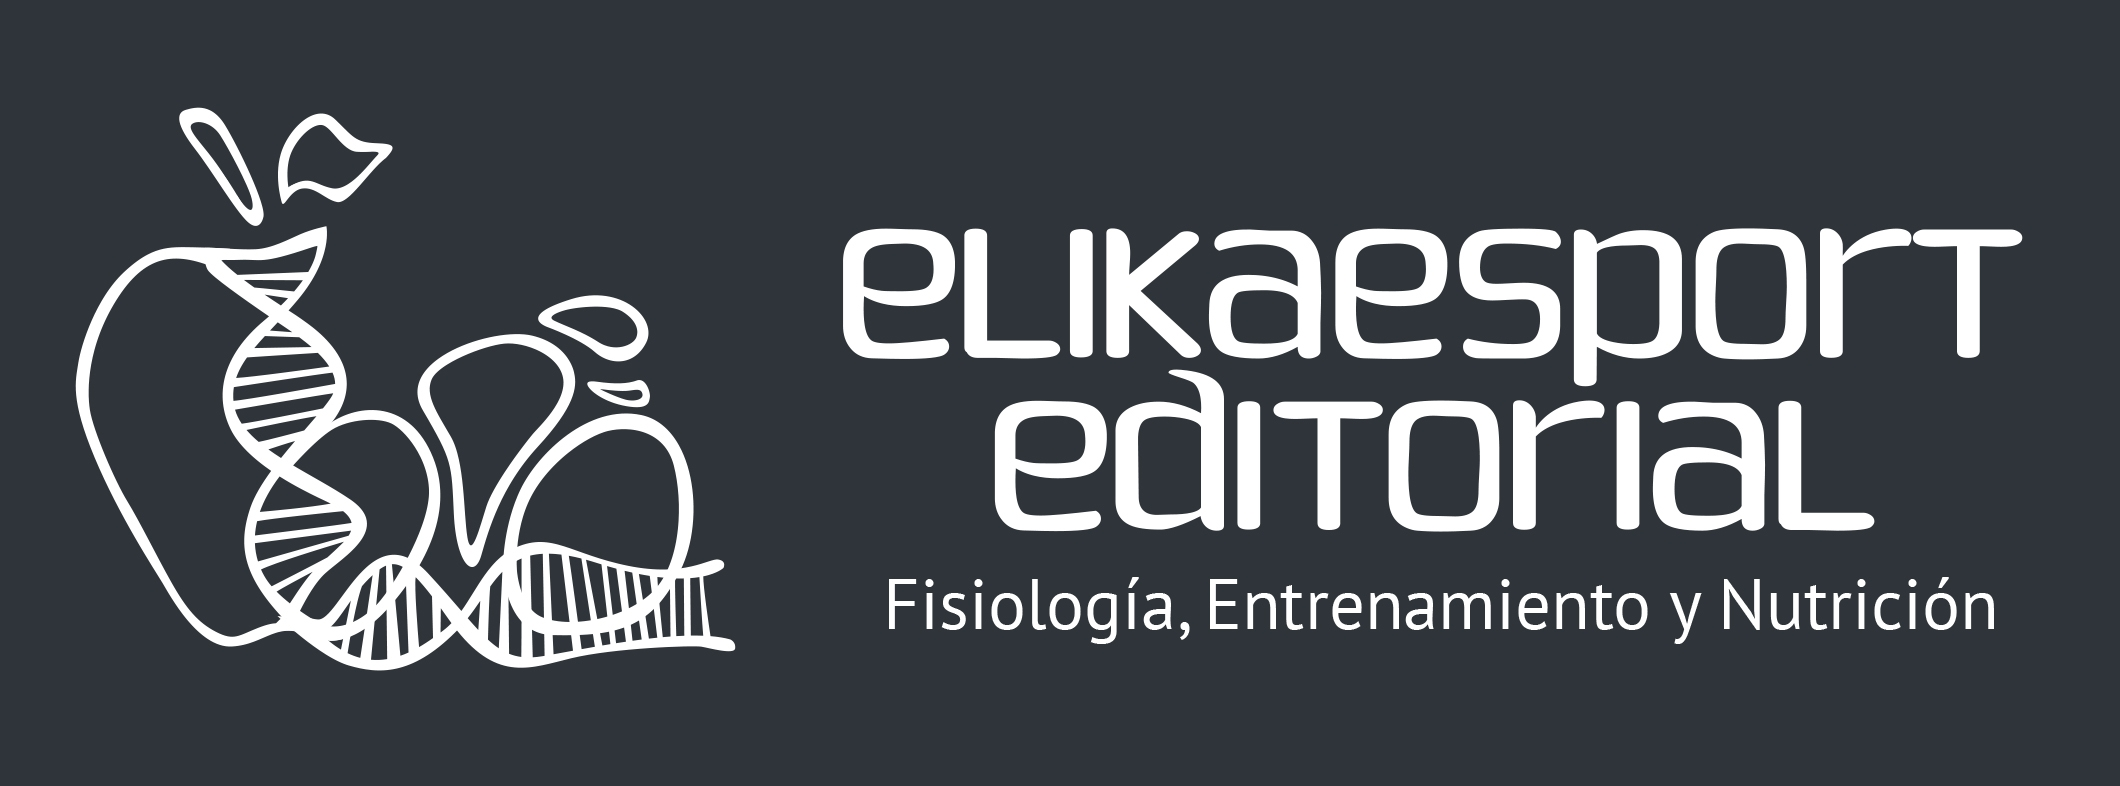 Elikaesport Editorial